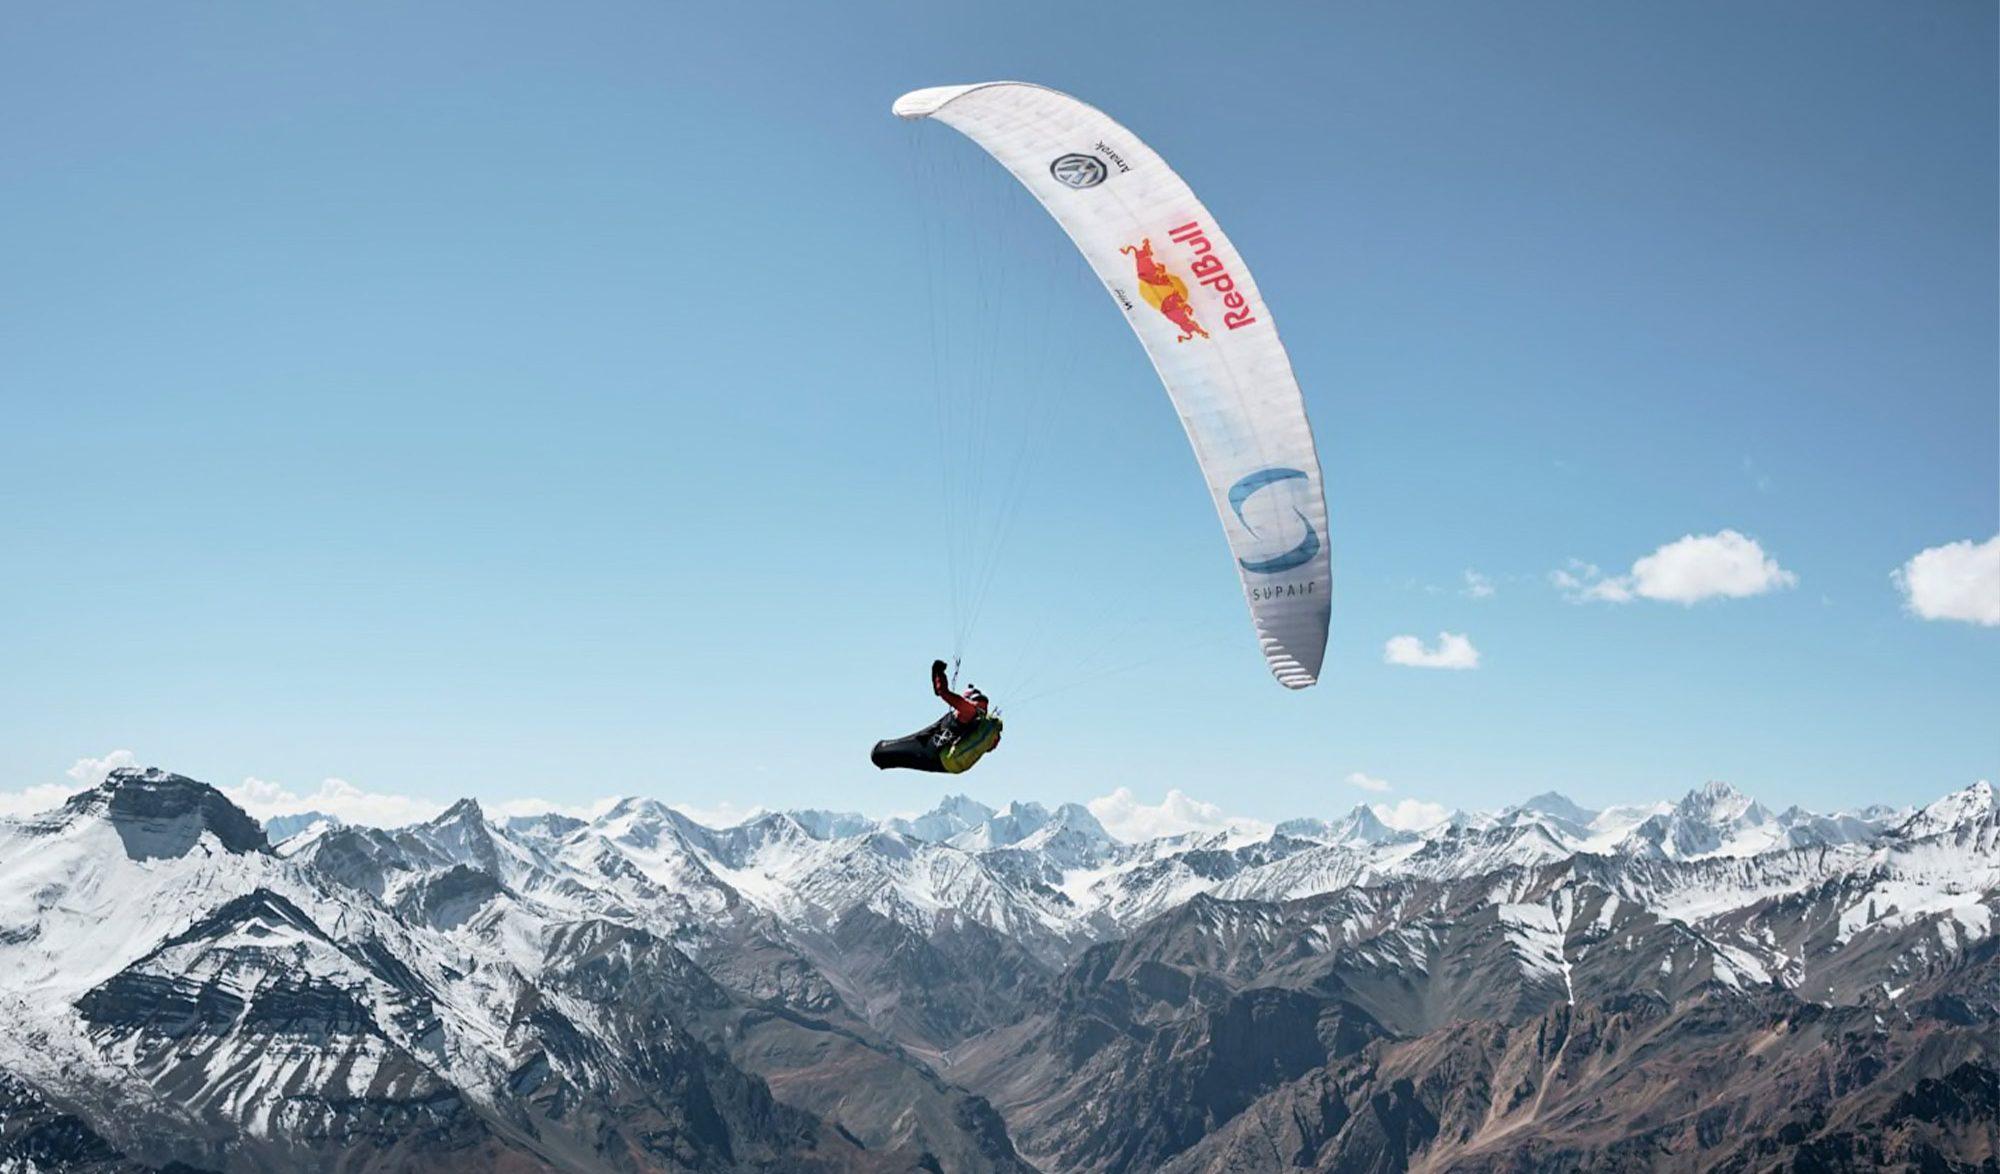 Higher Ground, paragliding the Himalaya